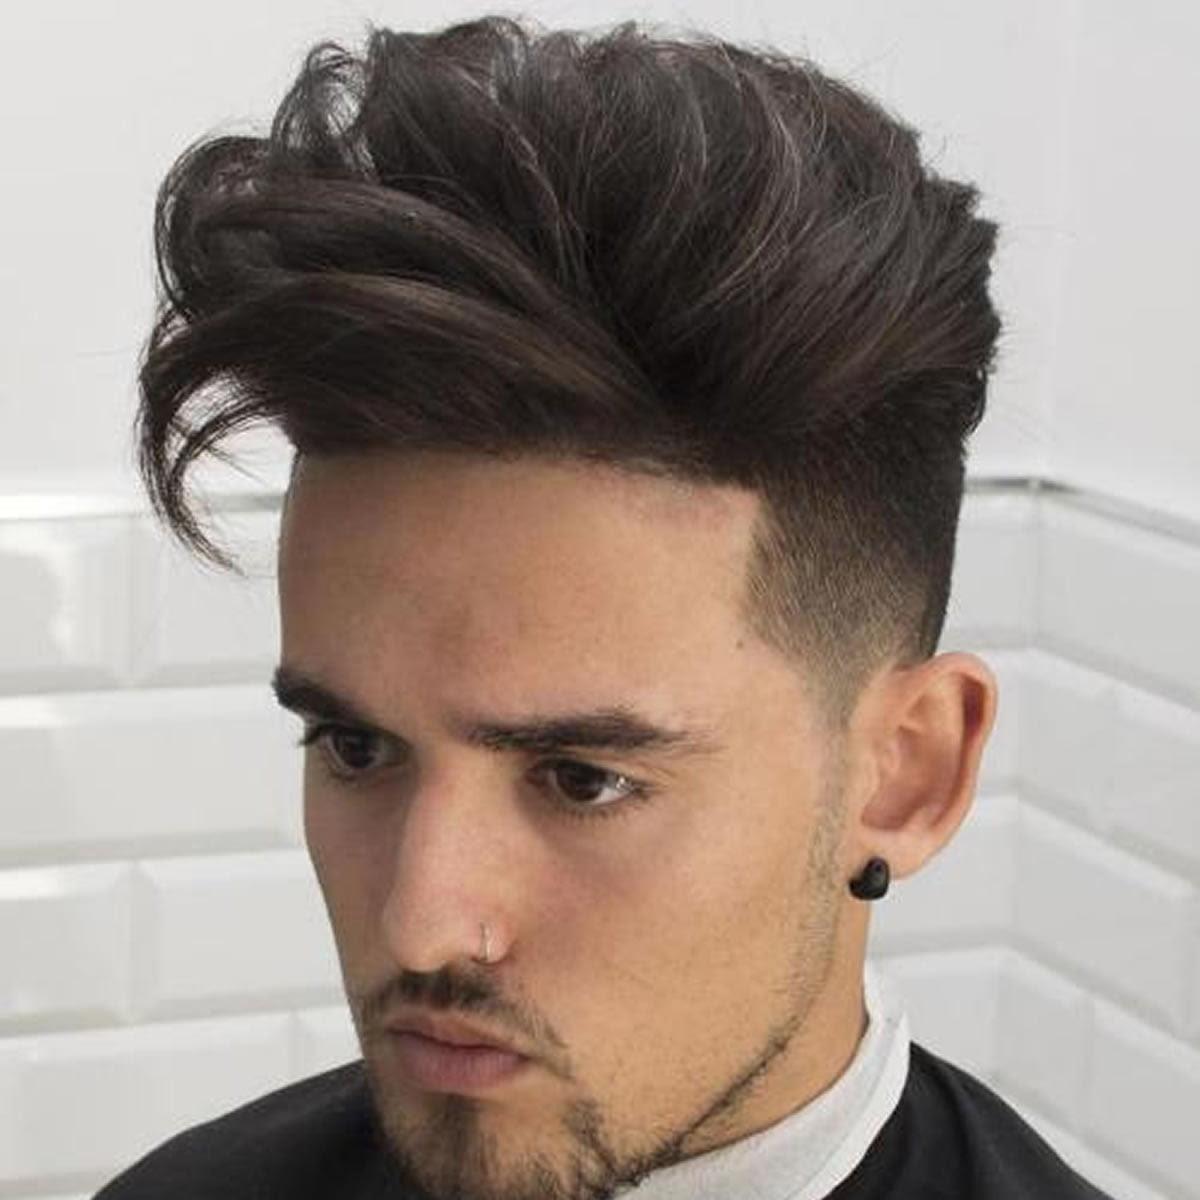 2018 Short Haircuts for Men – 17 Great Short Hair Ideas, Photos, Videos – HAIRSTYLES